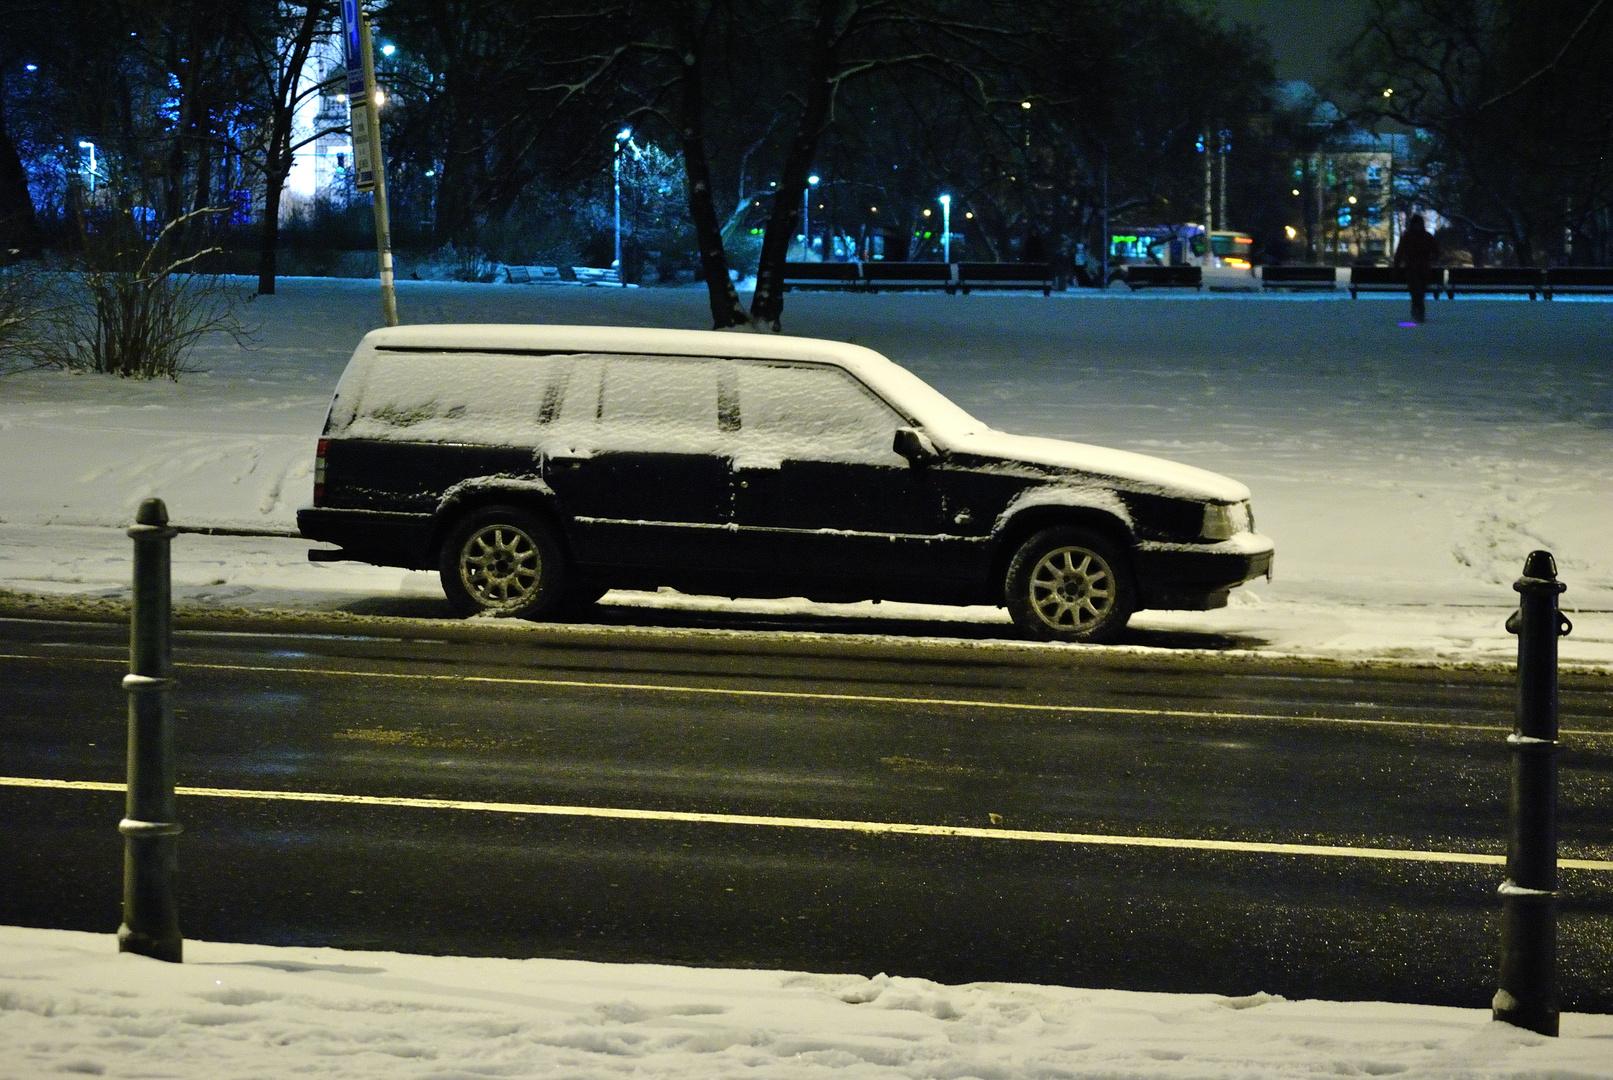 La nieve detiene.